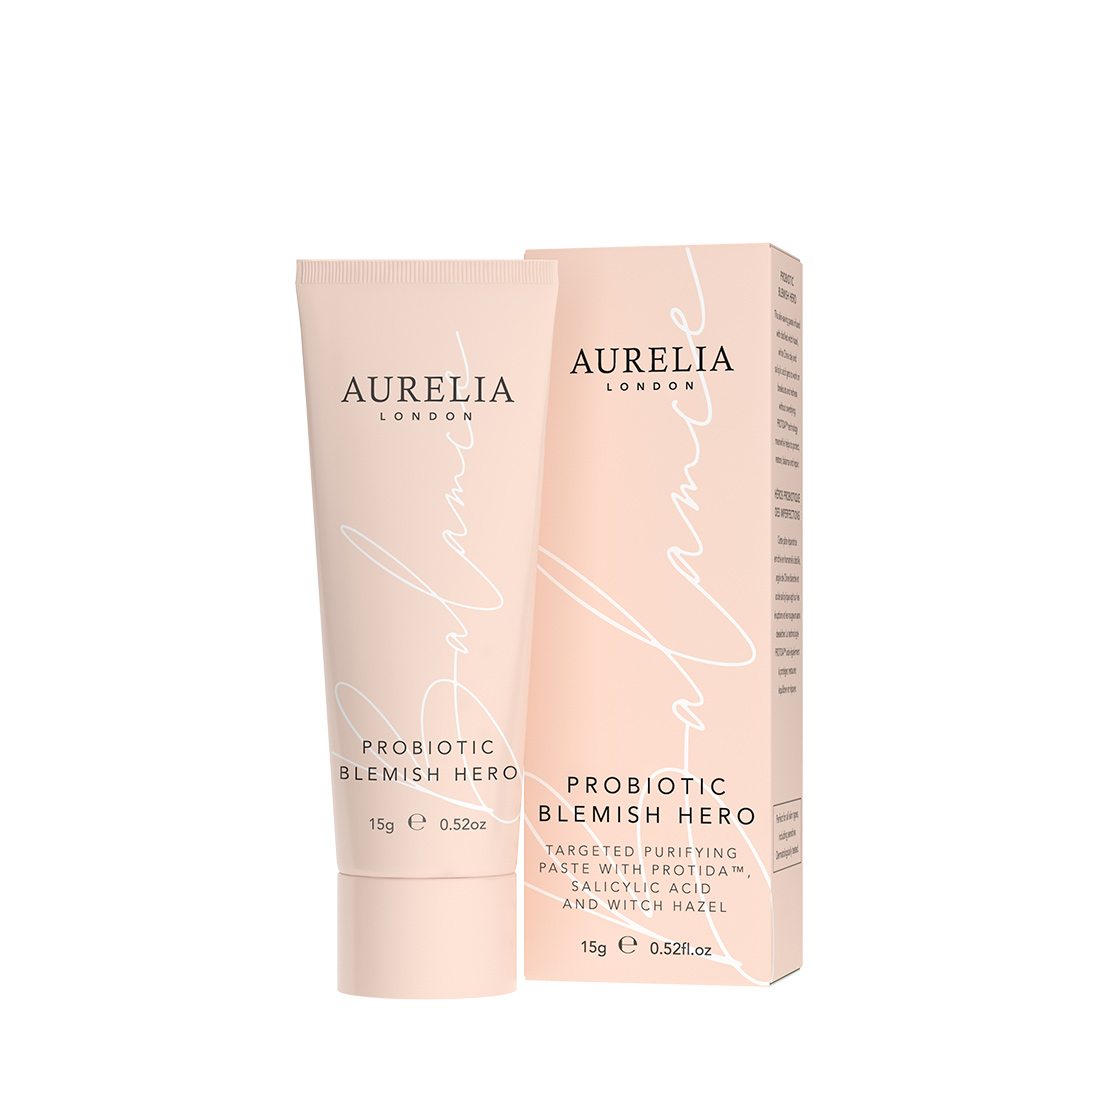 An image of Probiotic Blemish Hero 15ml Aurelia London, spot cream paste with salicylic acid